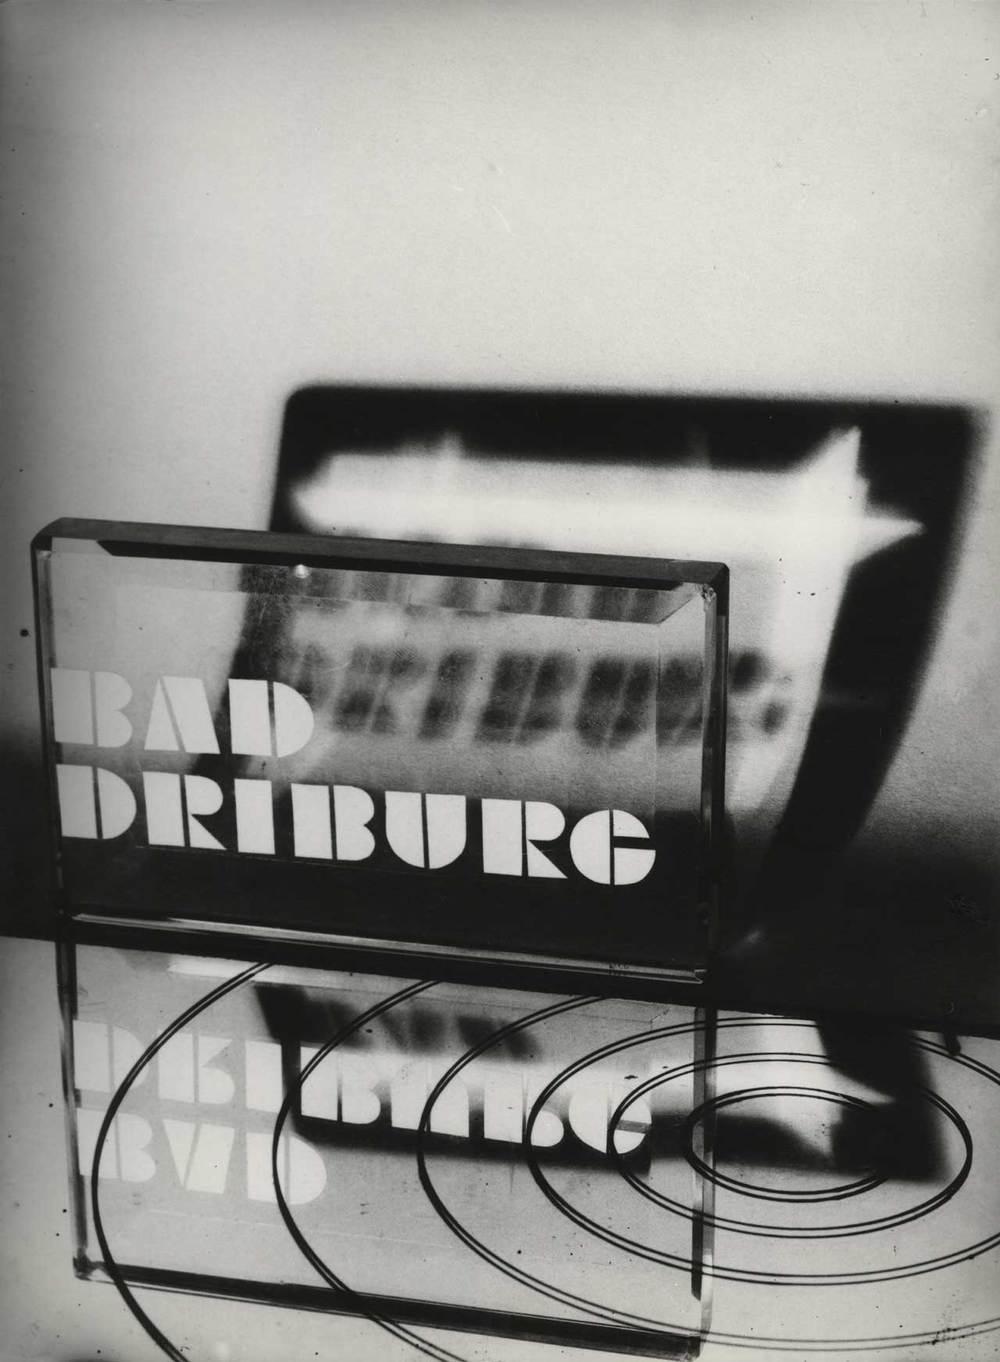 aiga-design-Wittkugel-1931-Bad-Driburg.jpg